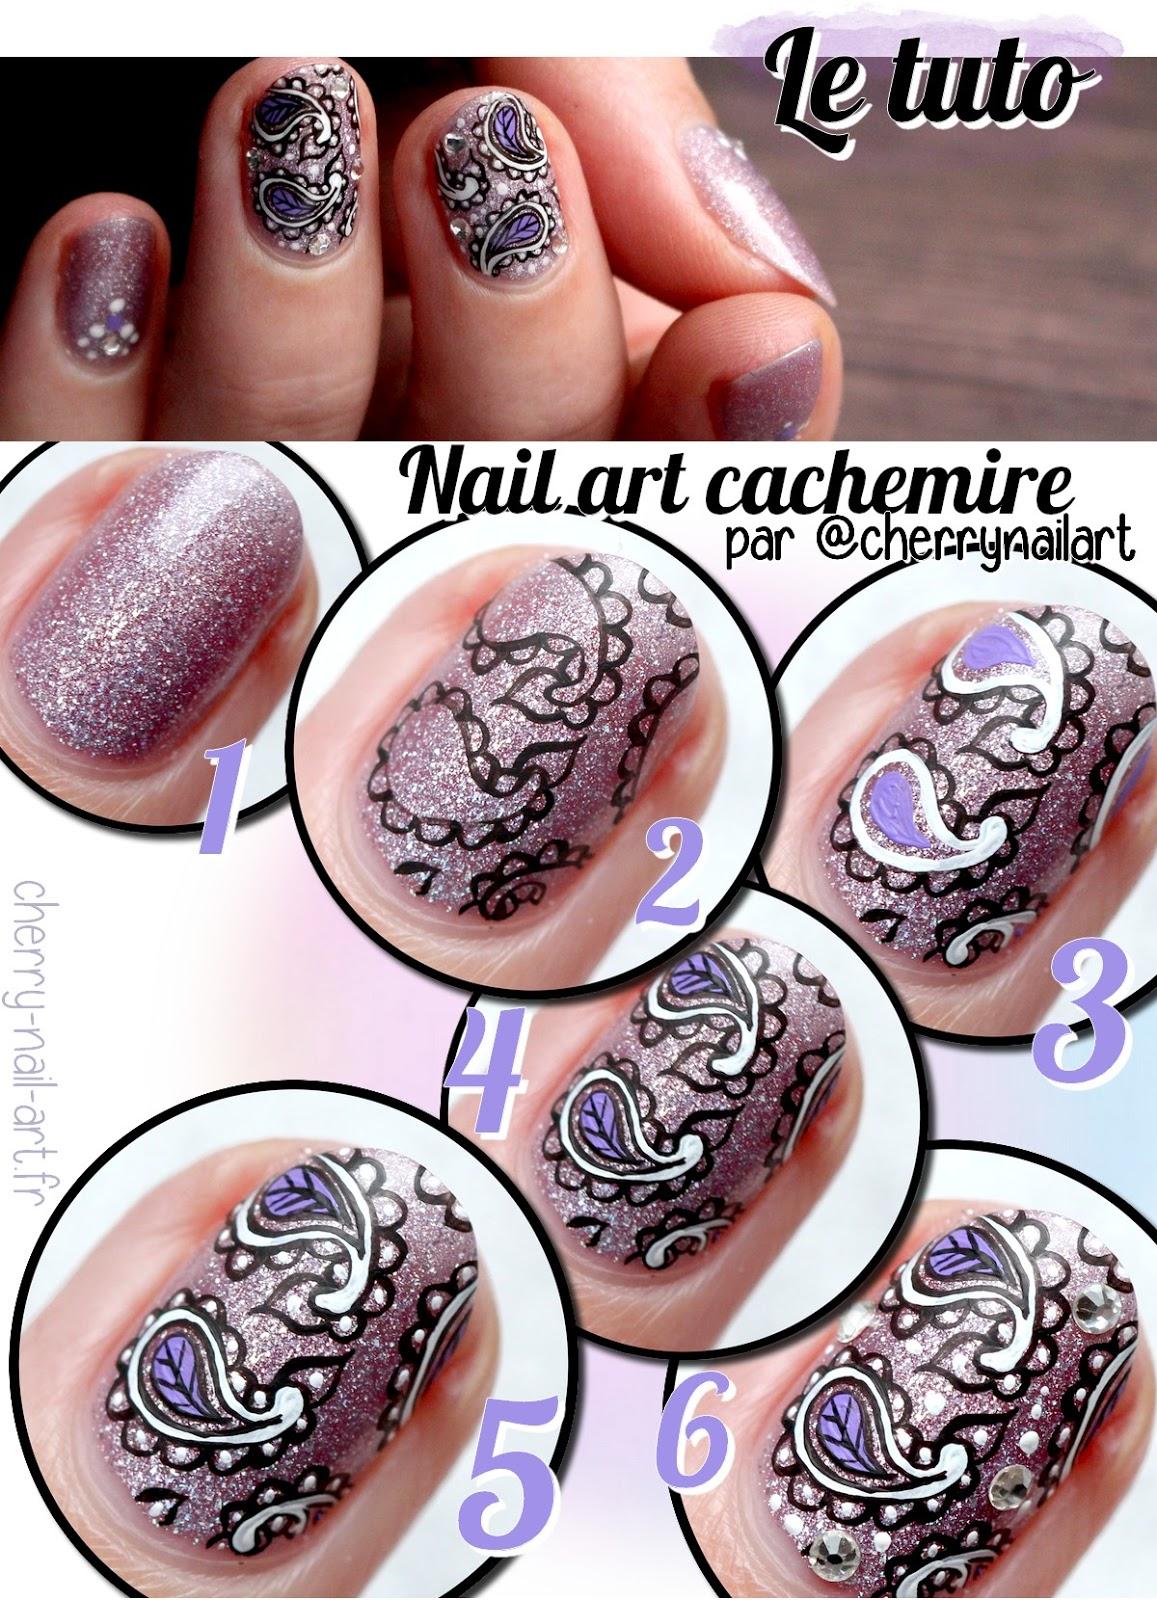 tuto-nail-art-cachemire-strass-paillettes